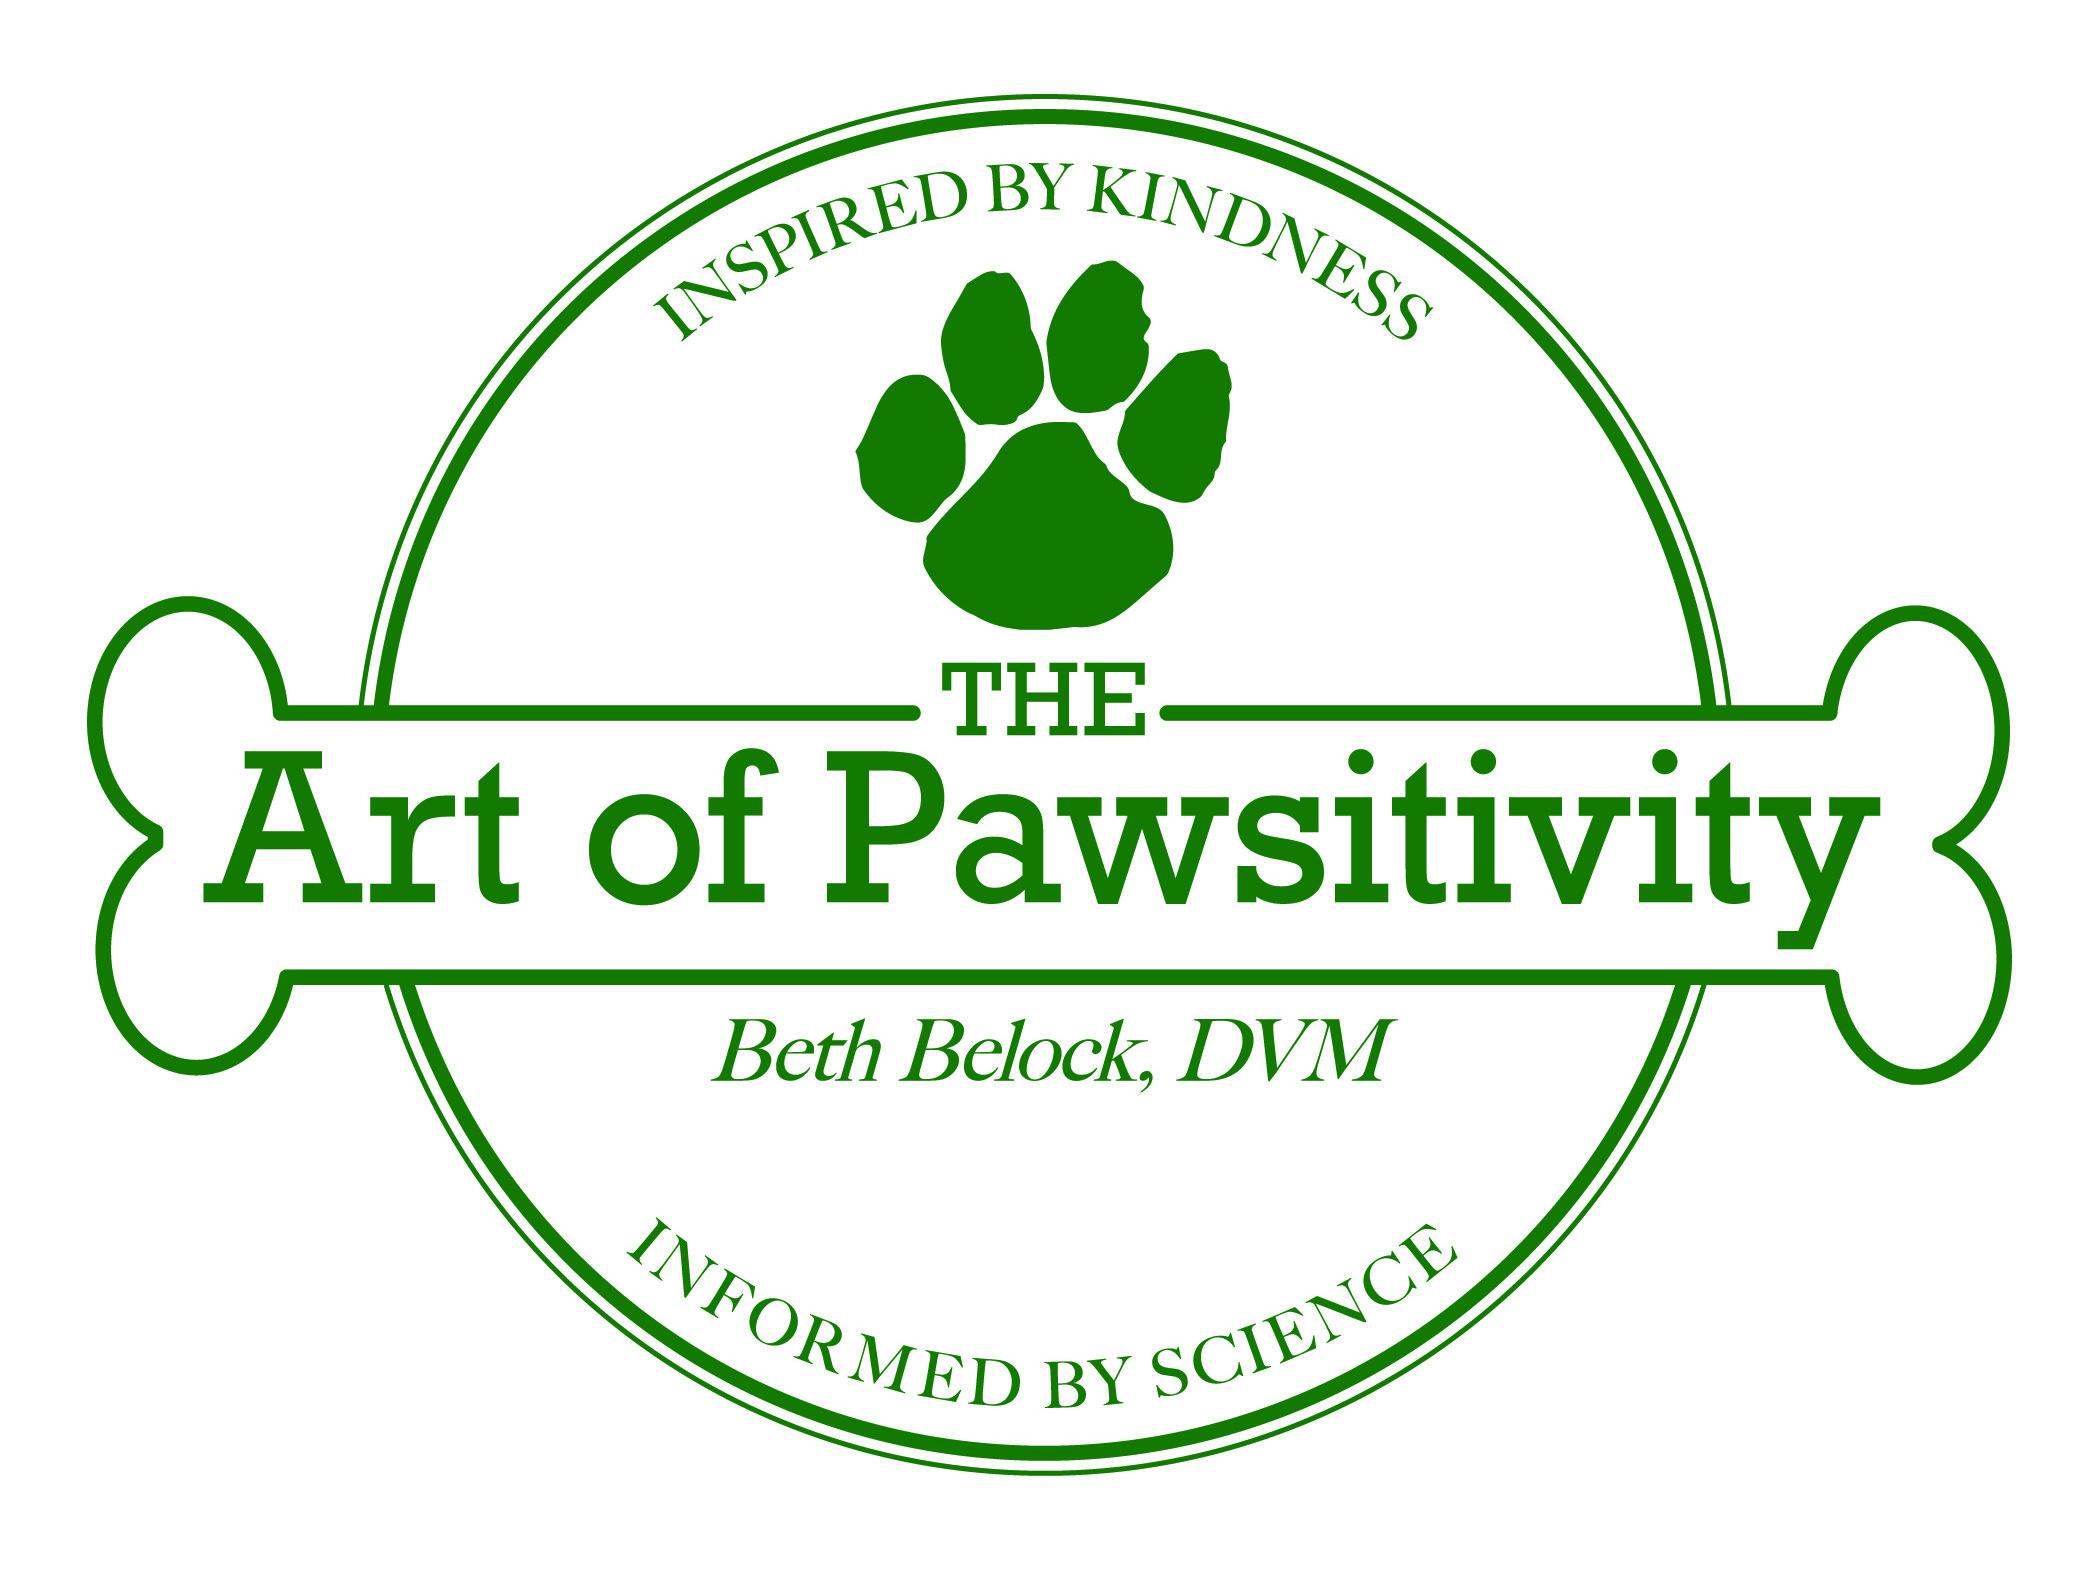 The Art of Pawsitivity